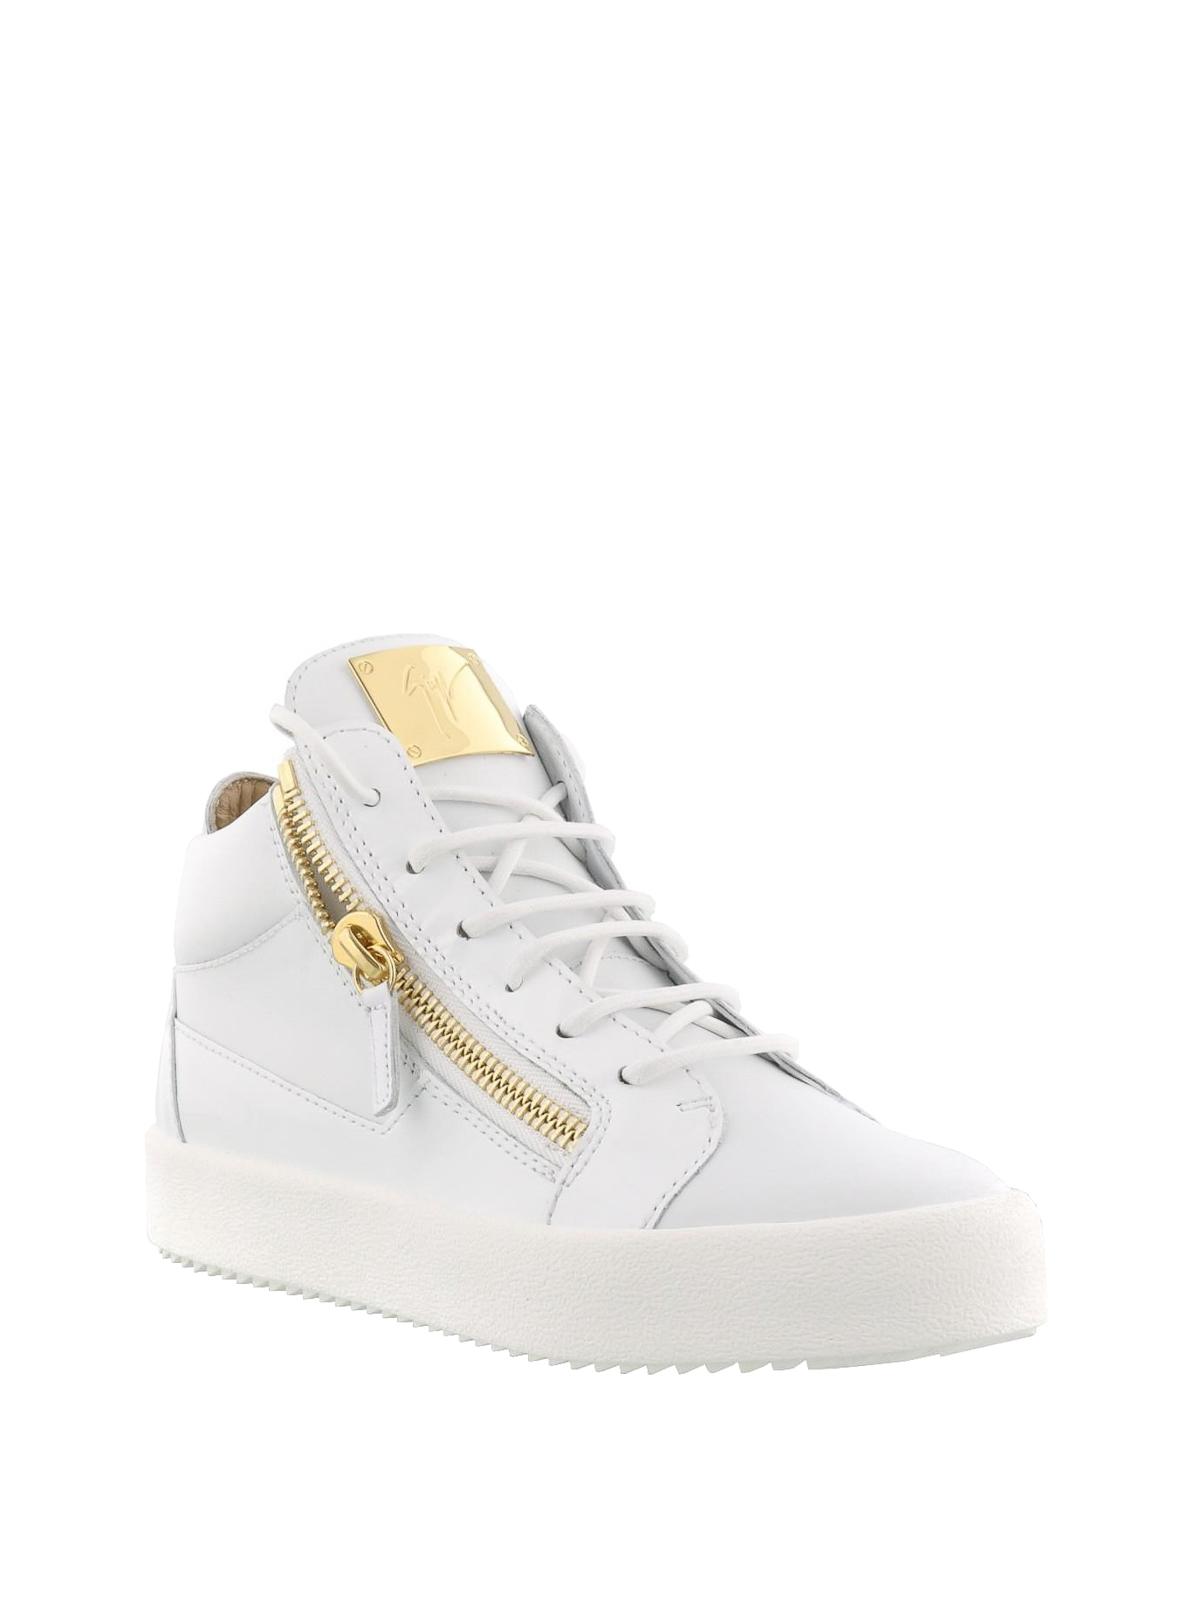 Giuseppe Zanotti Sneaker Kriss bianche in pelle e vernice